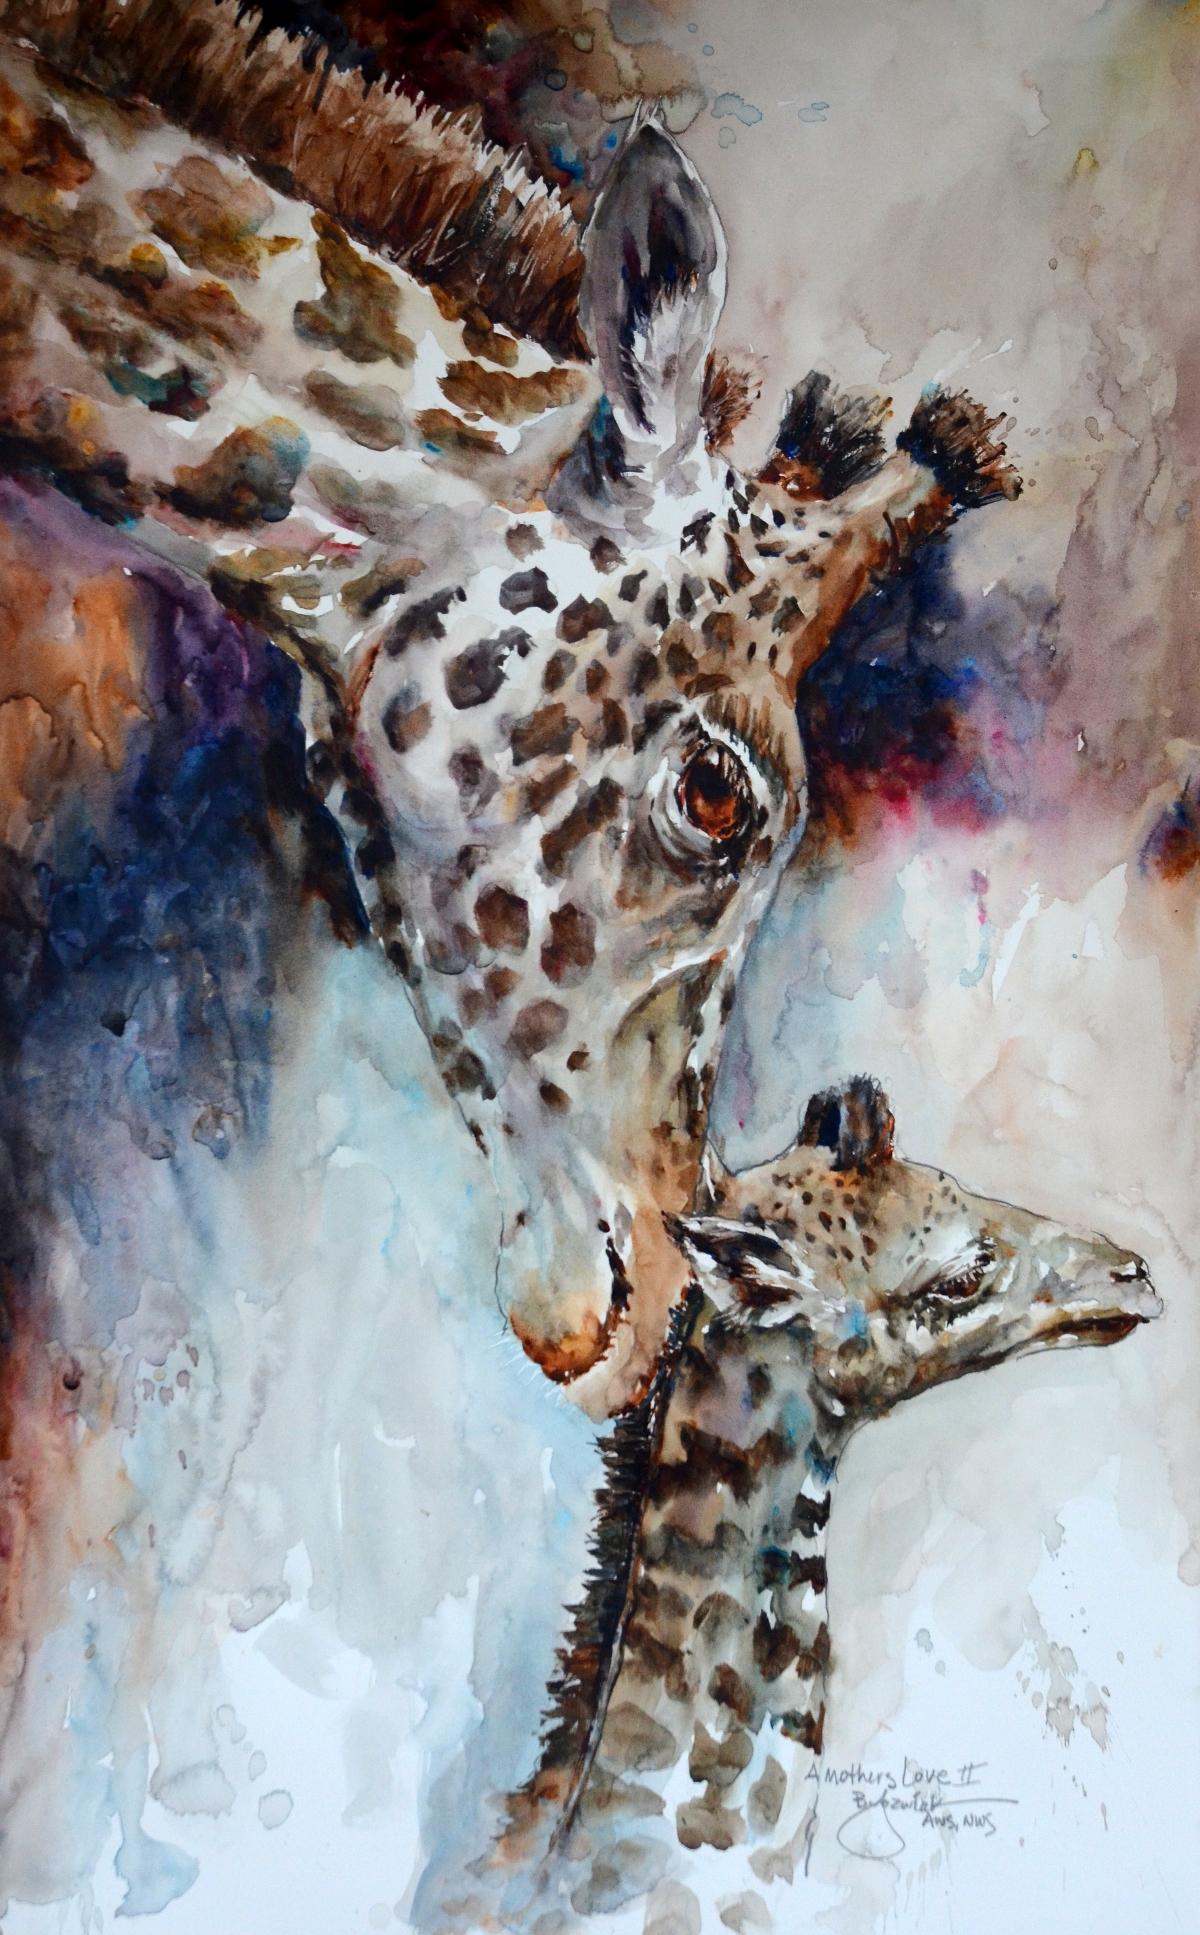 Bev Jozwiak – Cole Gallery ~ An Artist's Point of View